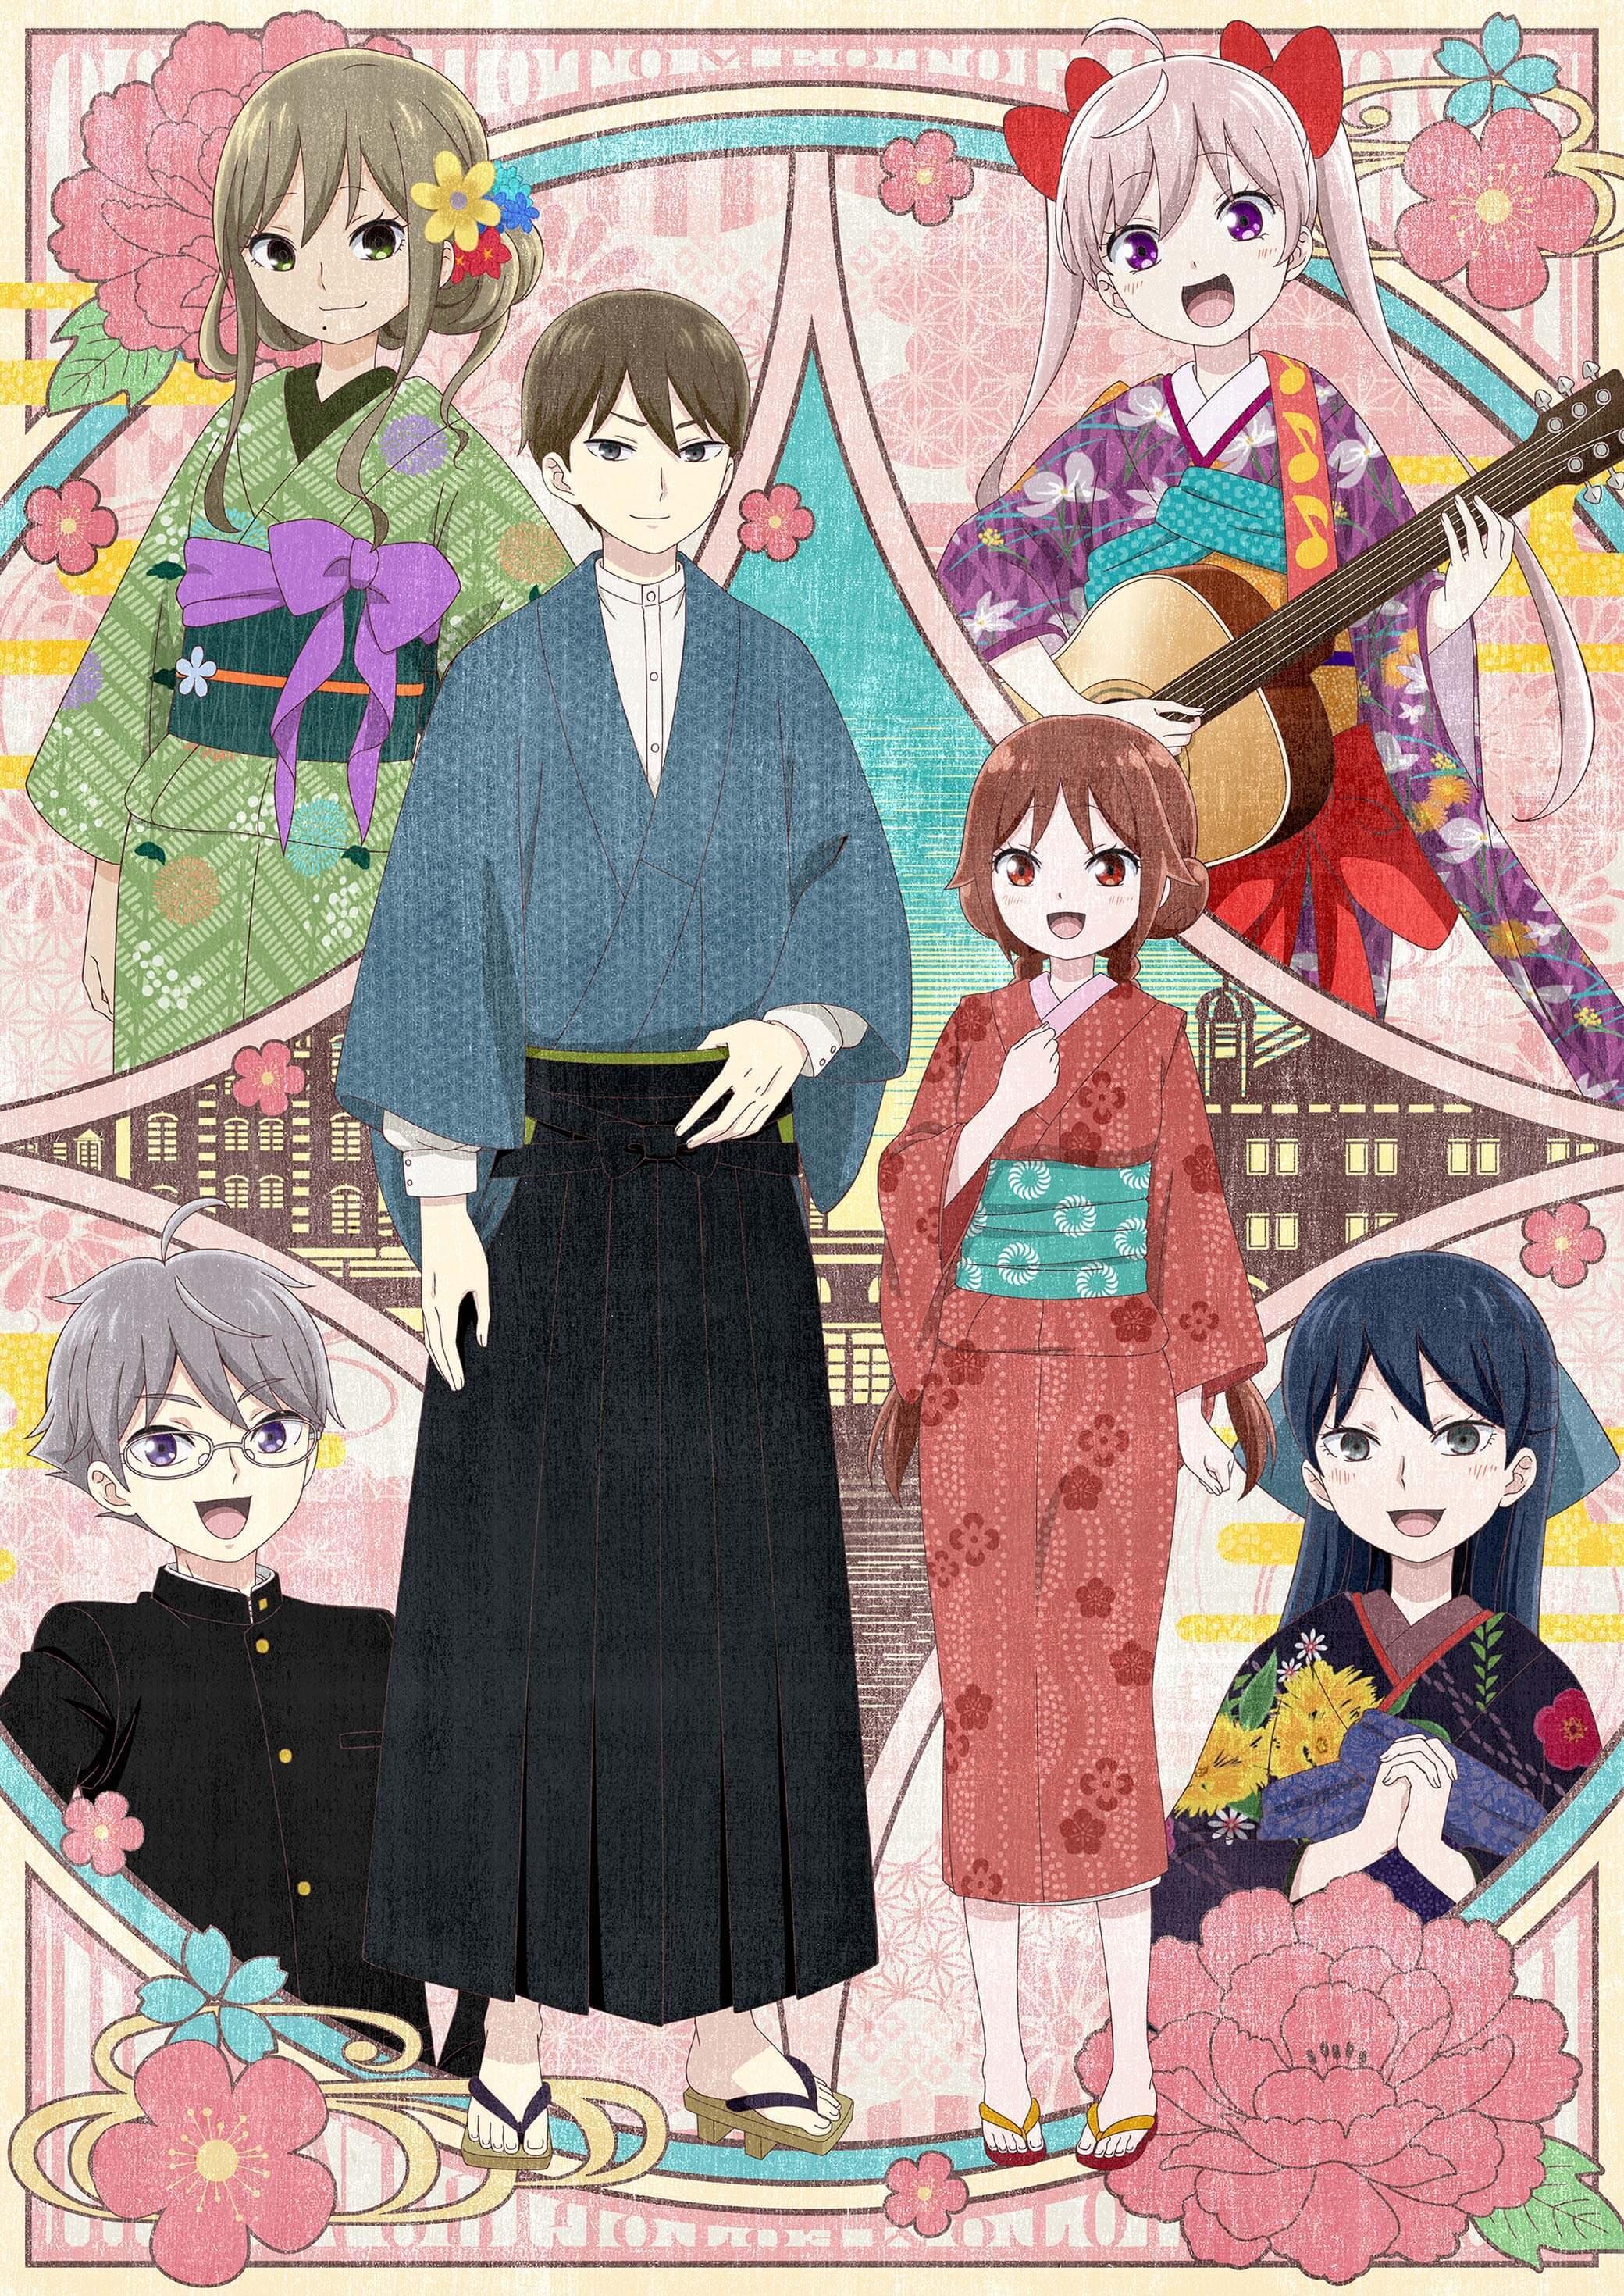 Taishou Otome Otogibanashi - Taishou Maiden Fairytale